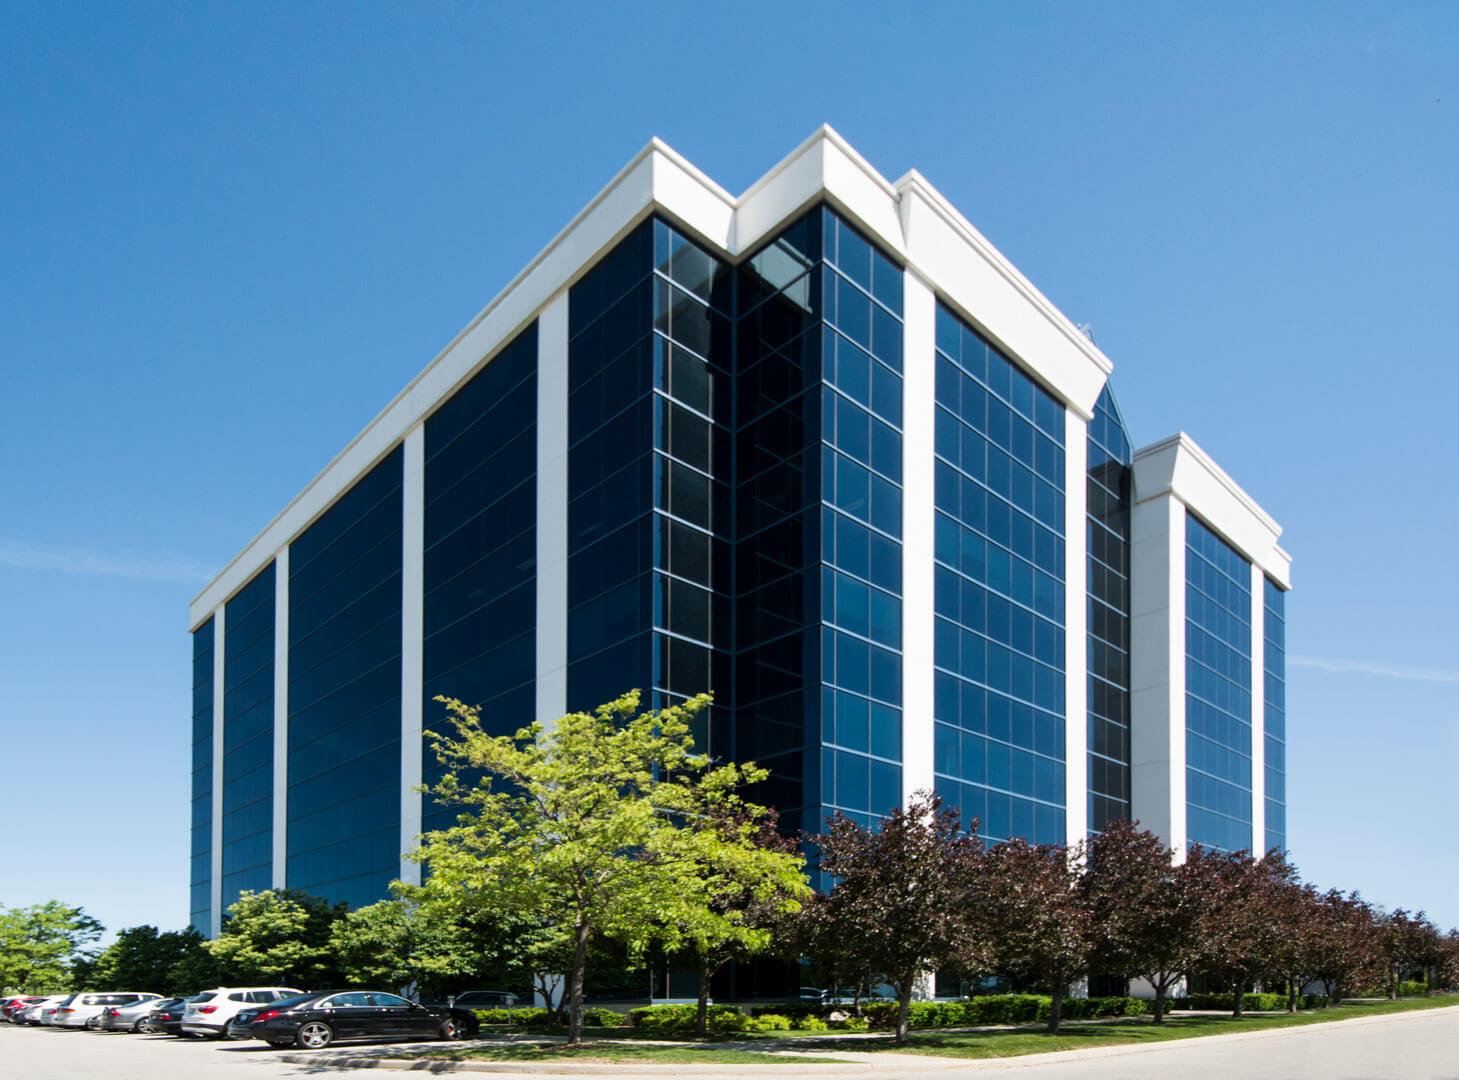 1111 International Blvd - full building view